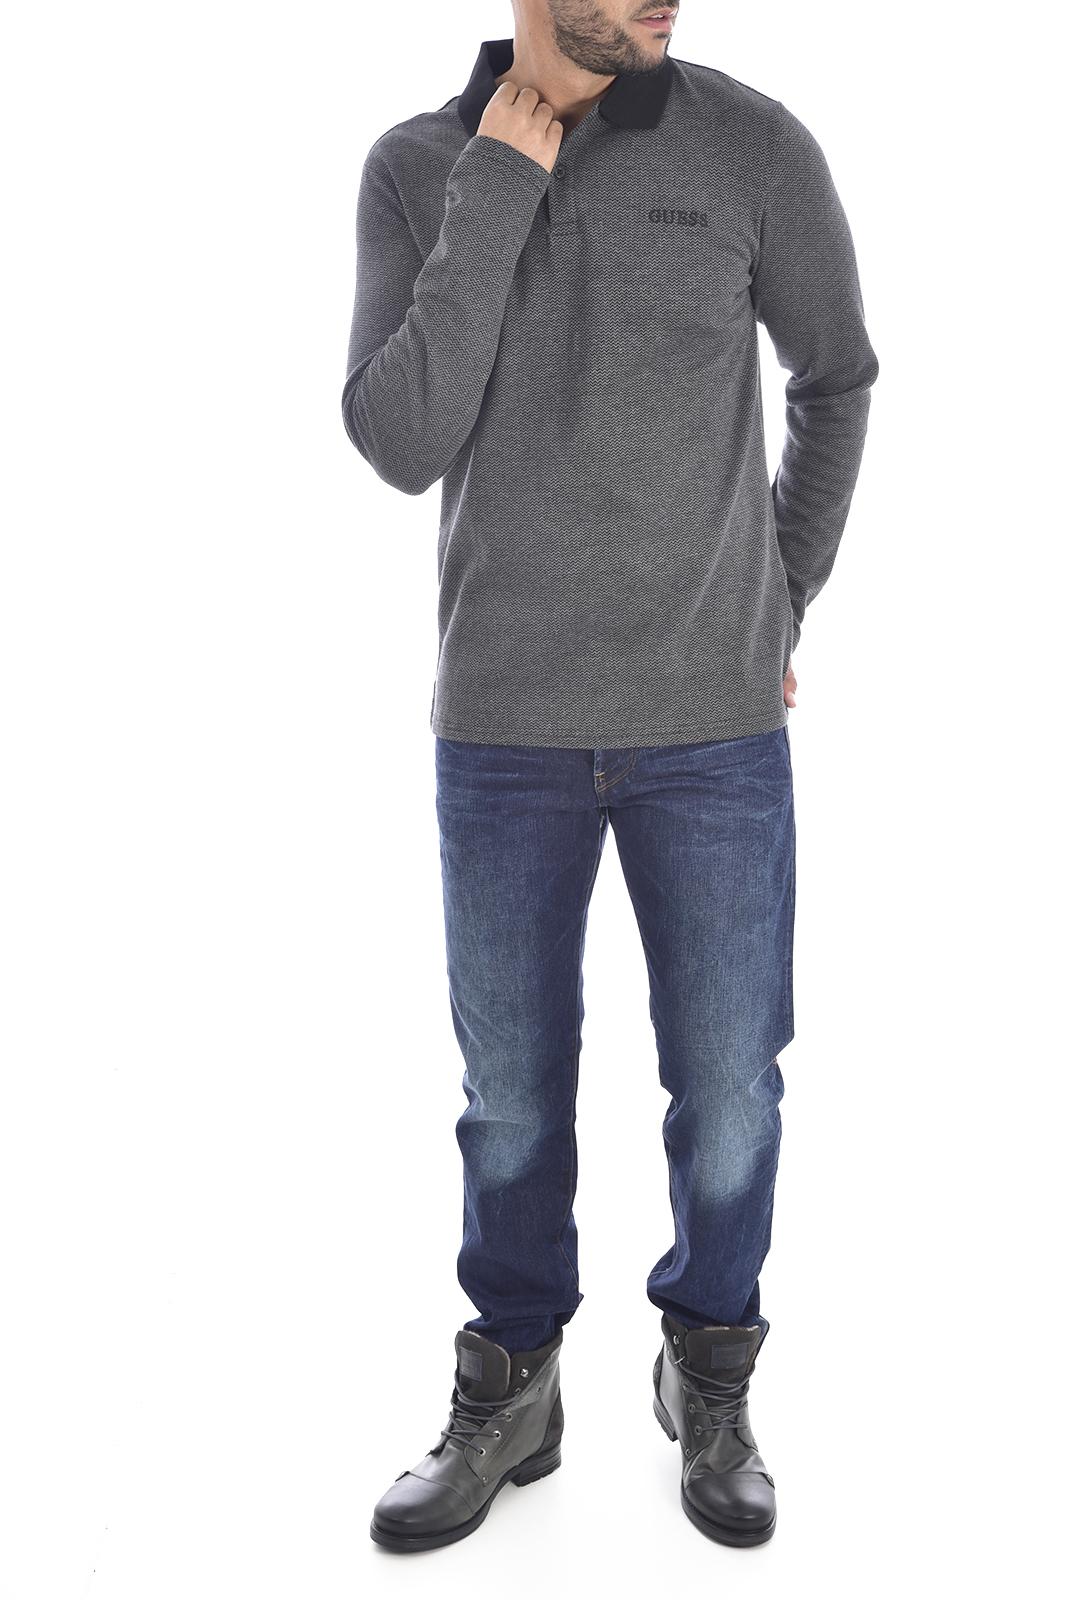 Polos  Guess jeans M94P40 K93R0 FY90 BLACK HERRINGBONE